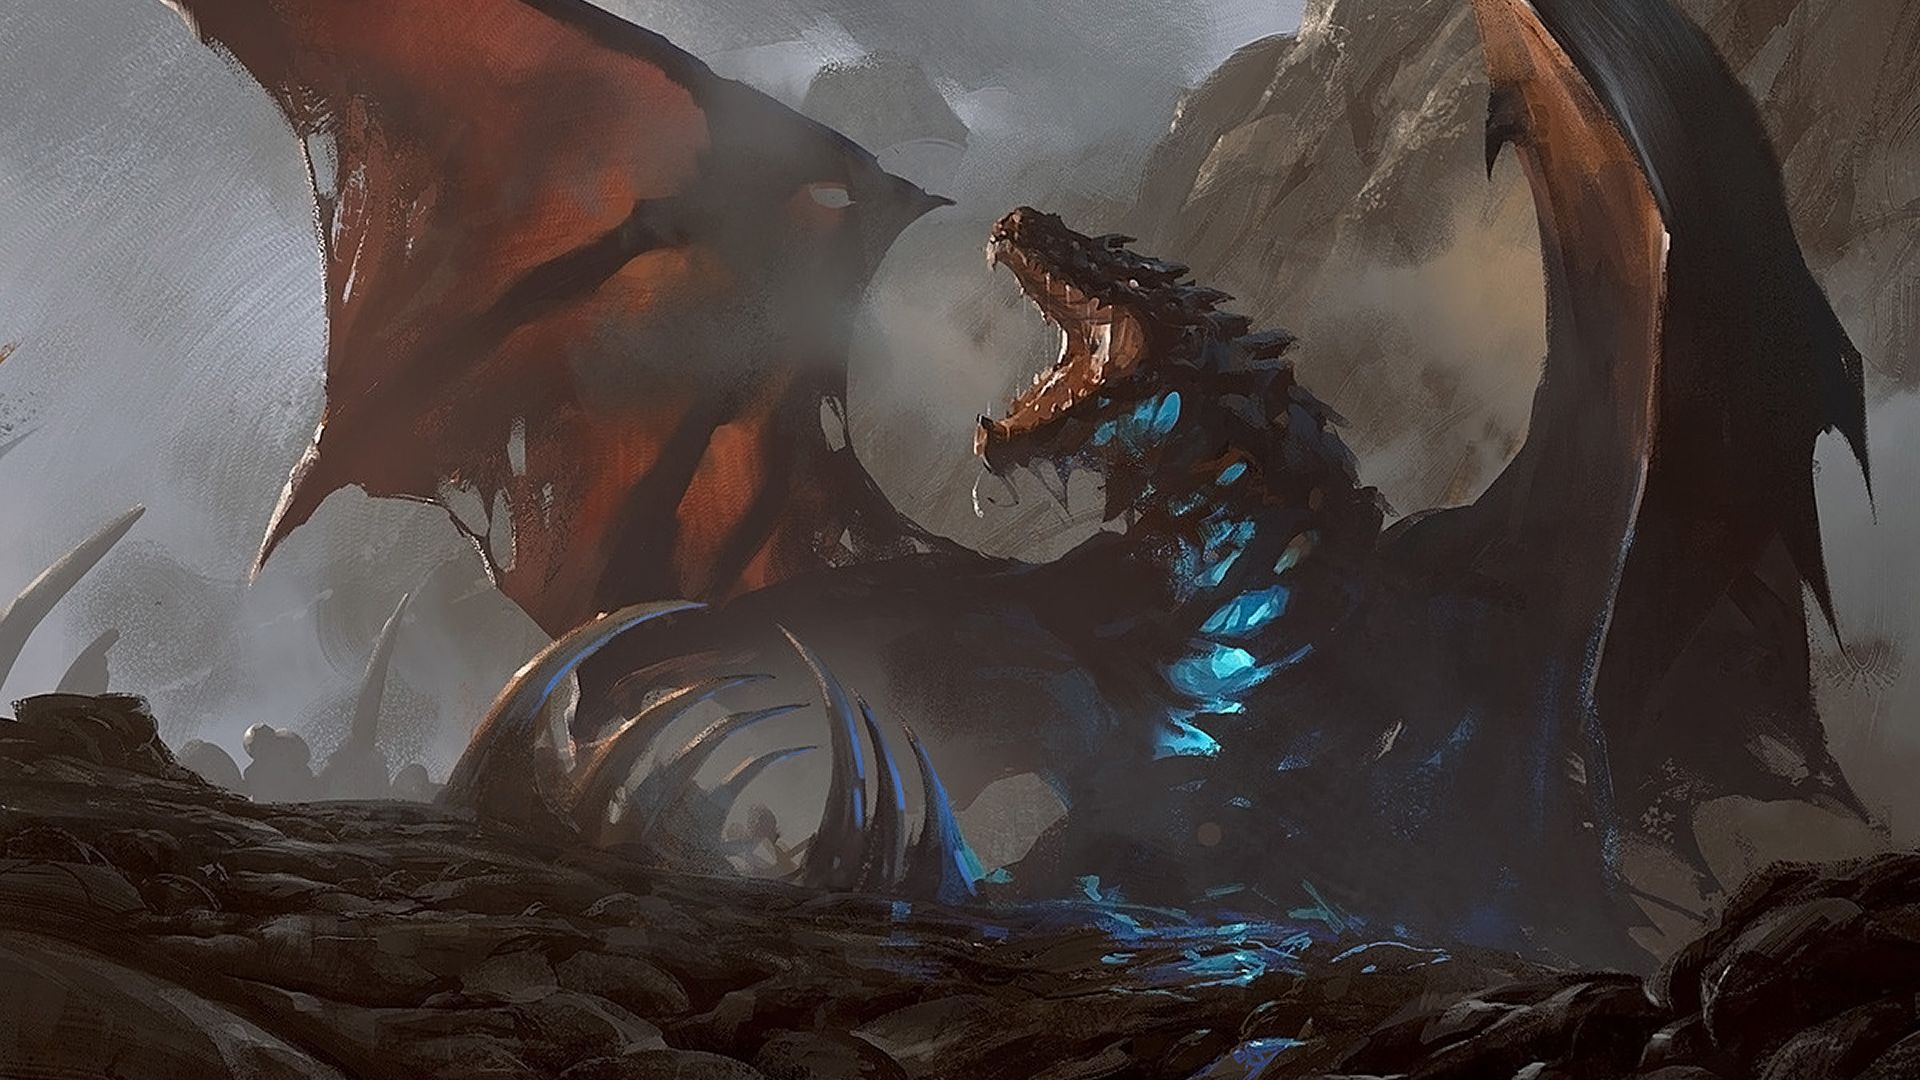 Desktop Wallpaper Dragon Fantasy Wings Dark Hd Image Picture